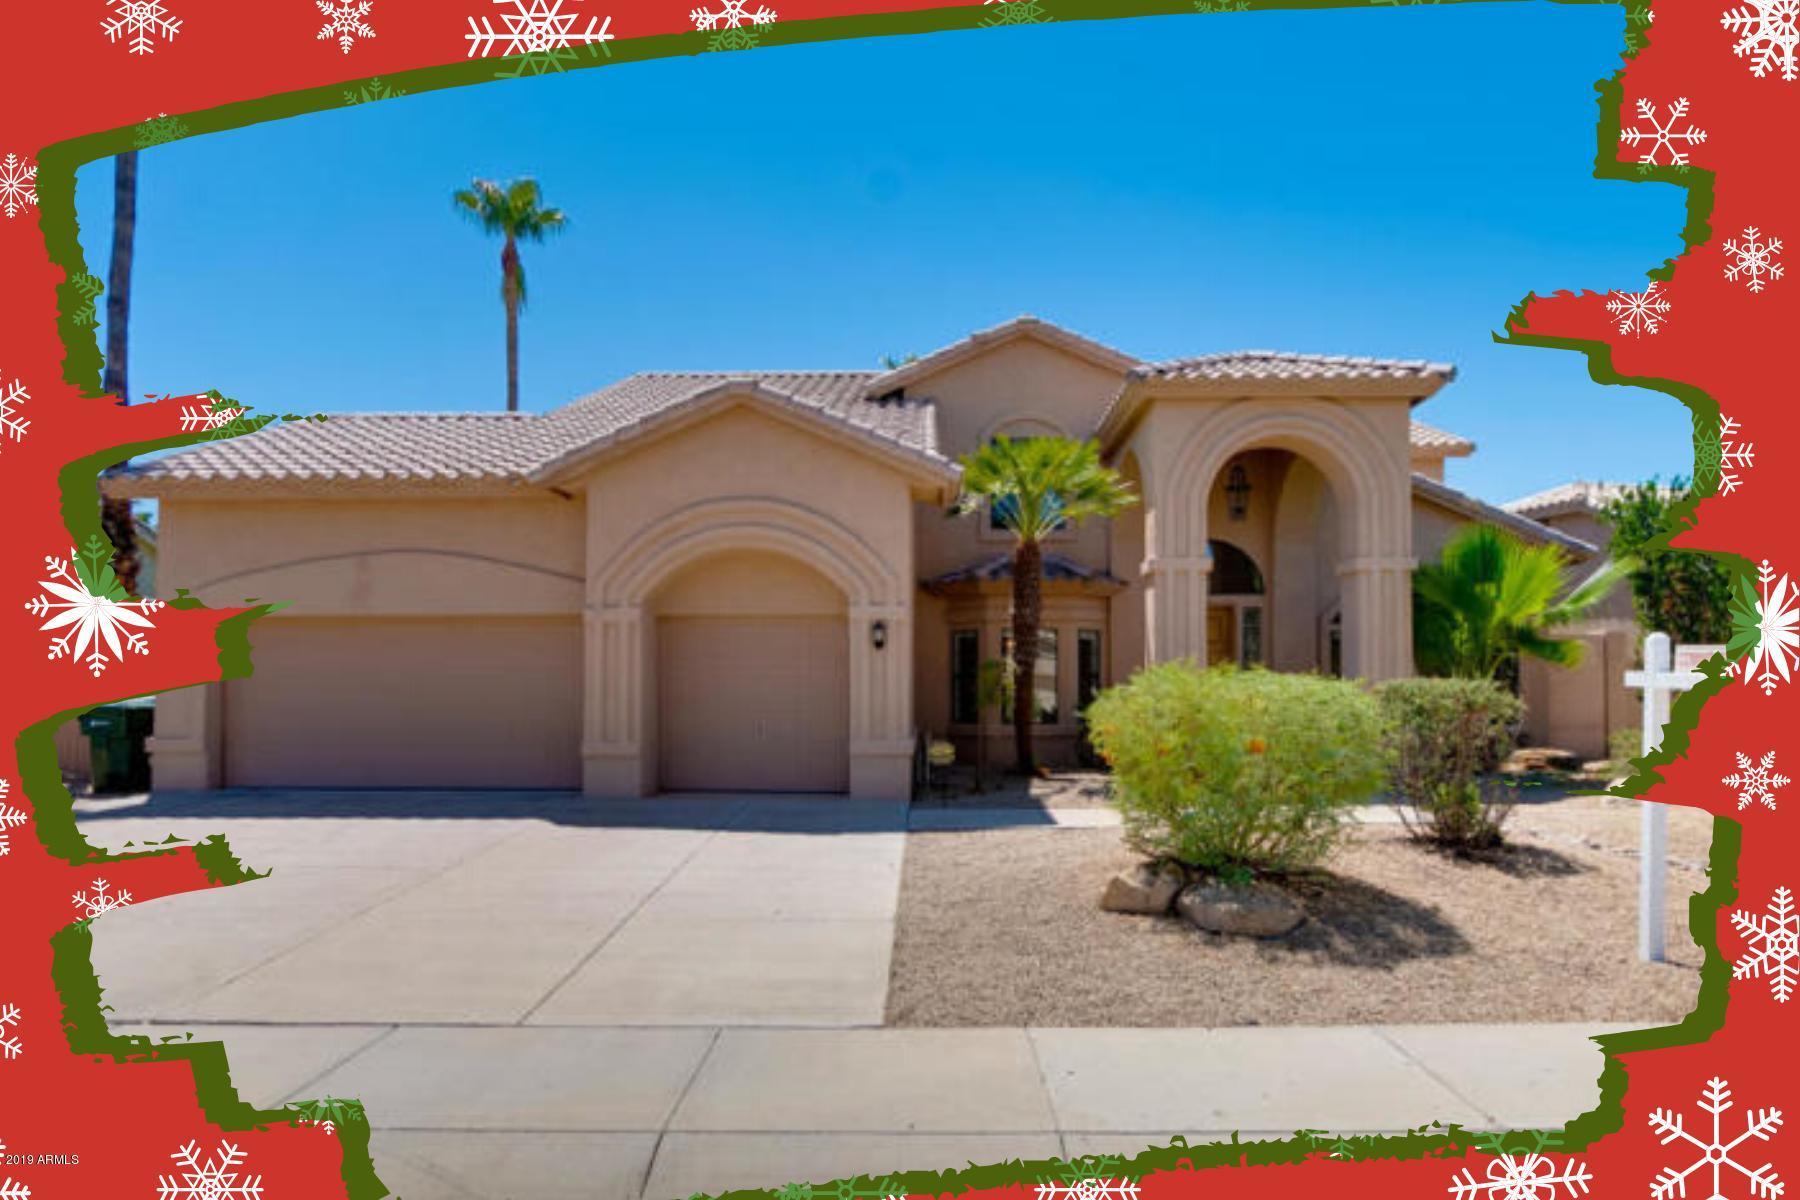 Photo of 2731 E Hillery Drive, Phoenix, AZ 85032